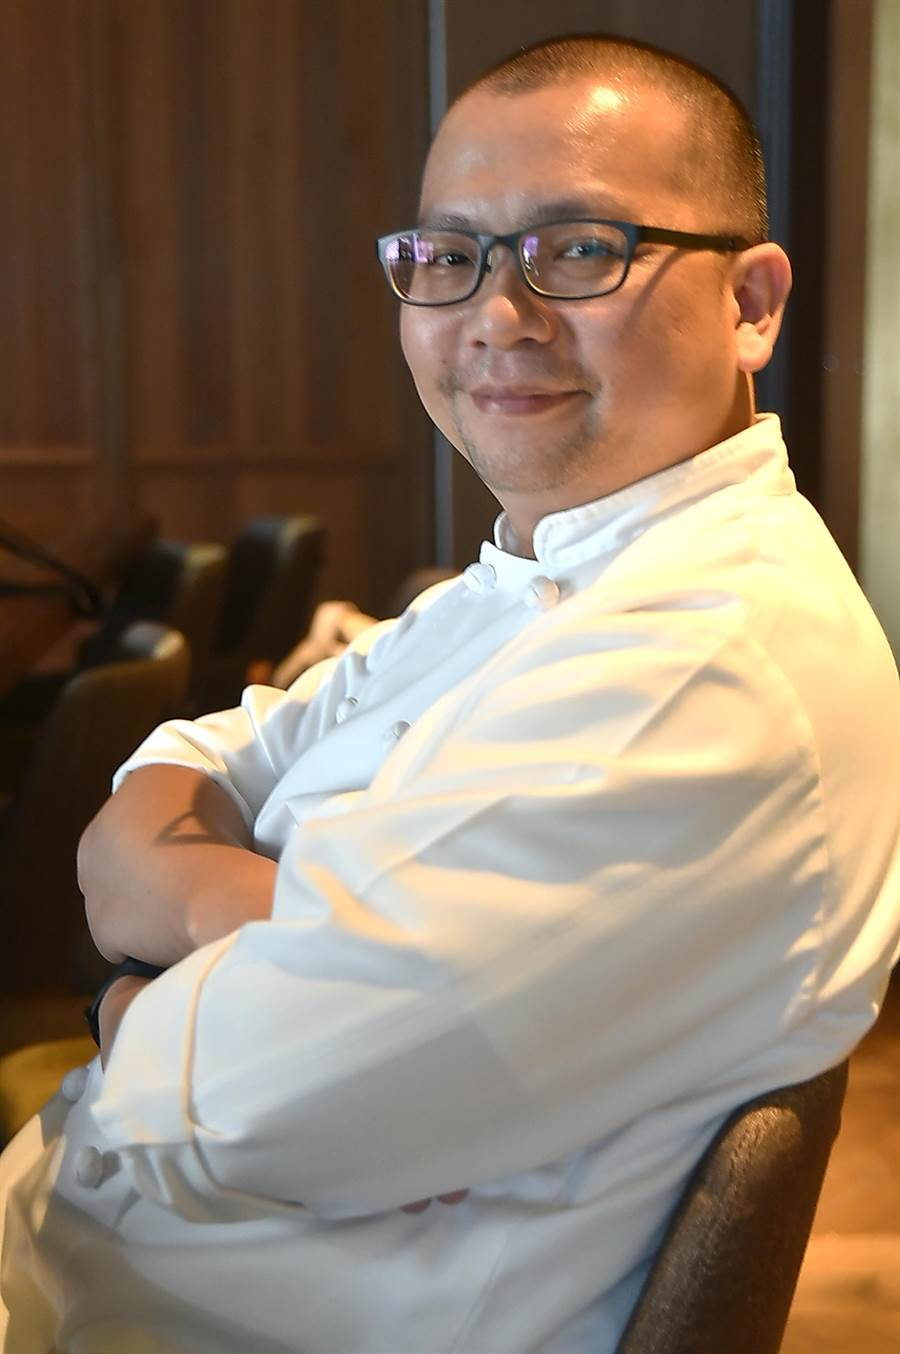 〈 TK SEAFOOD & STEAK〉主廚蔡泰源的廚功札實,不走花俏取巧路線,他烹調料理的牛排與海鮮風味和口感都很有水準。(圖/姚舜)